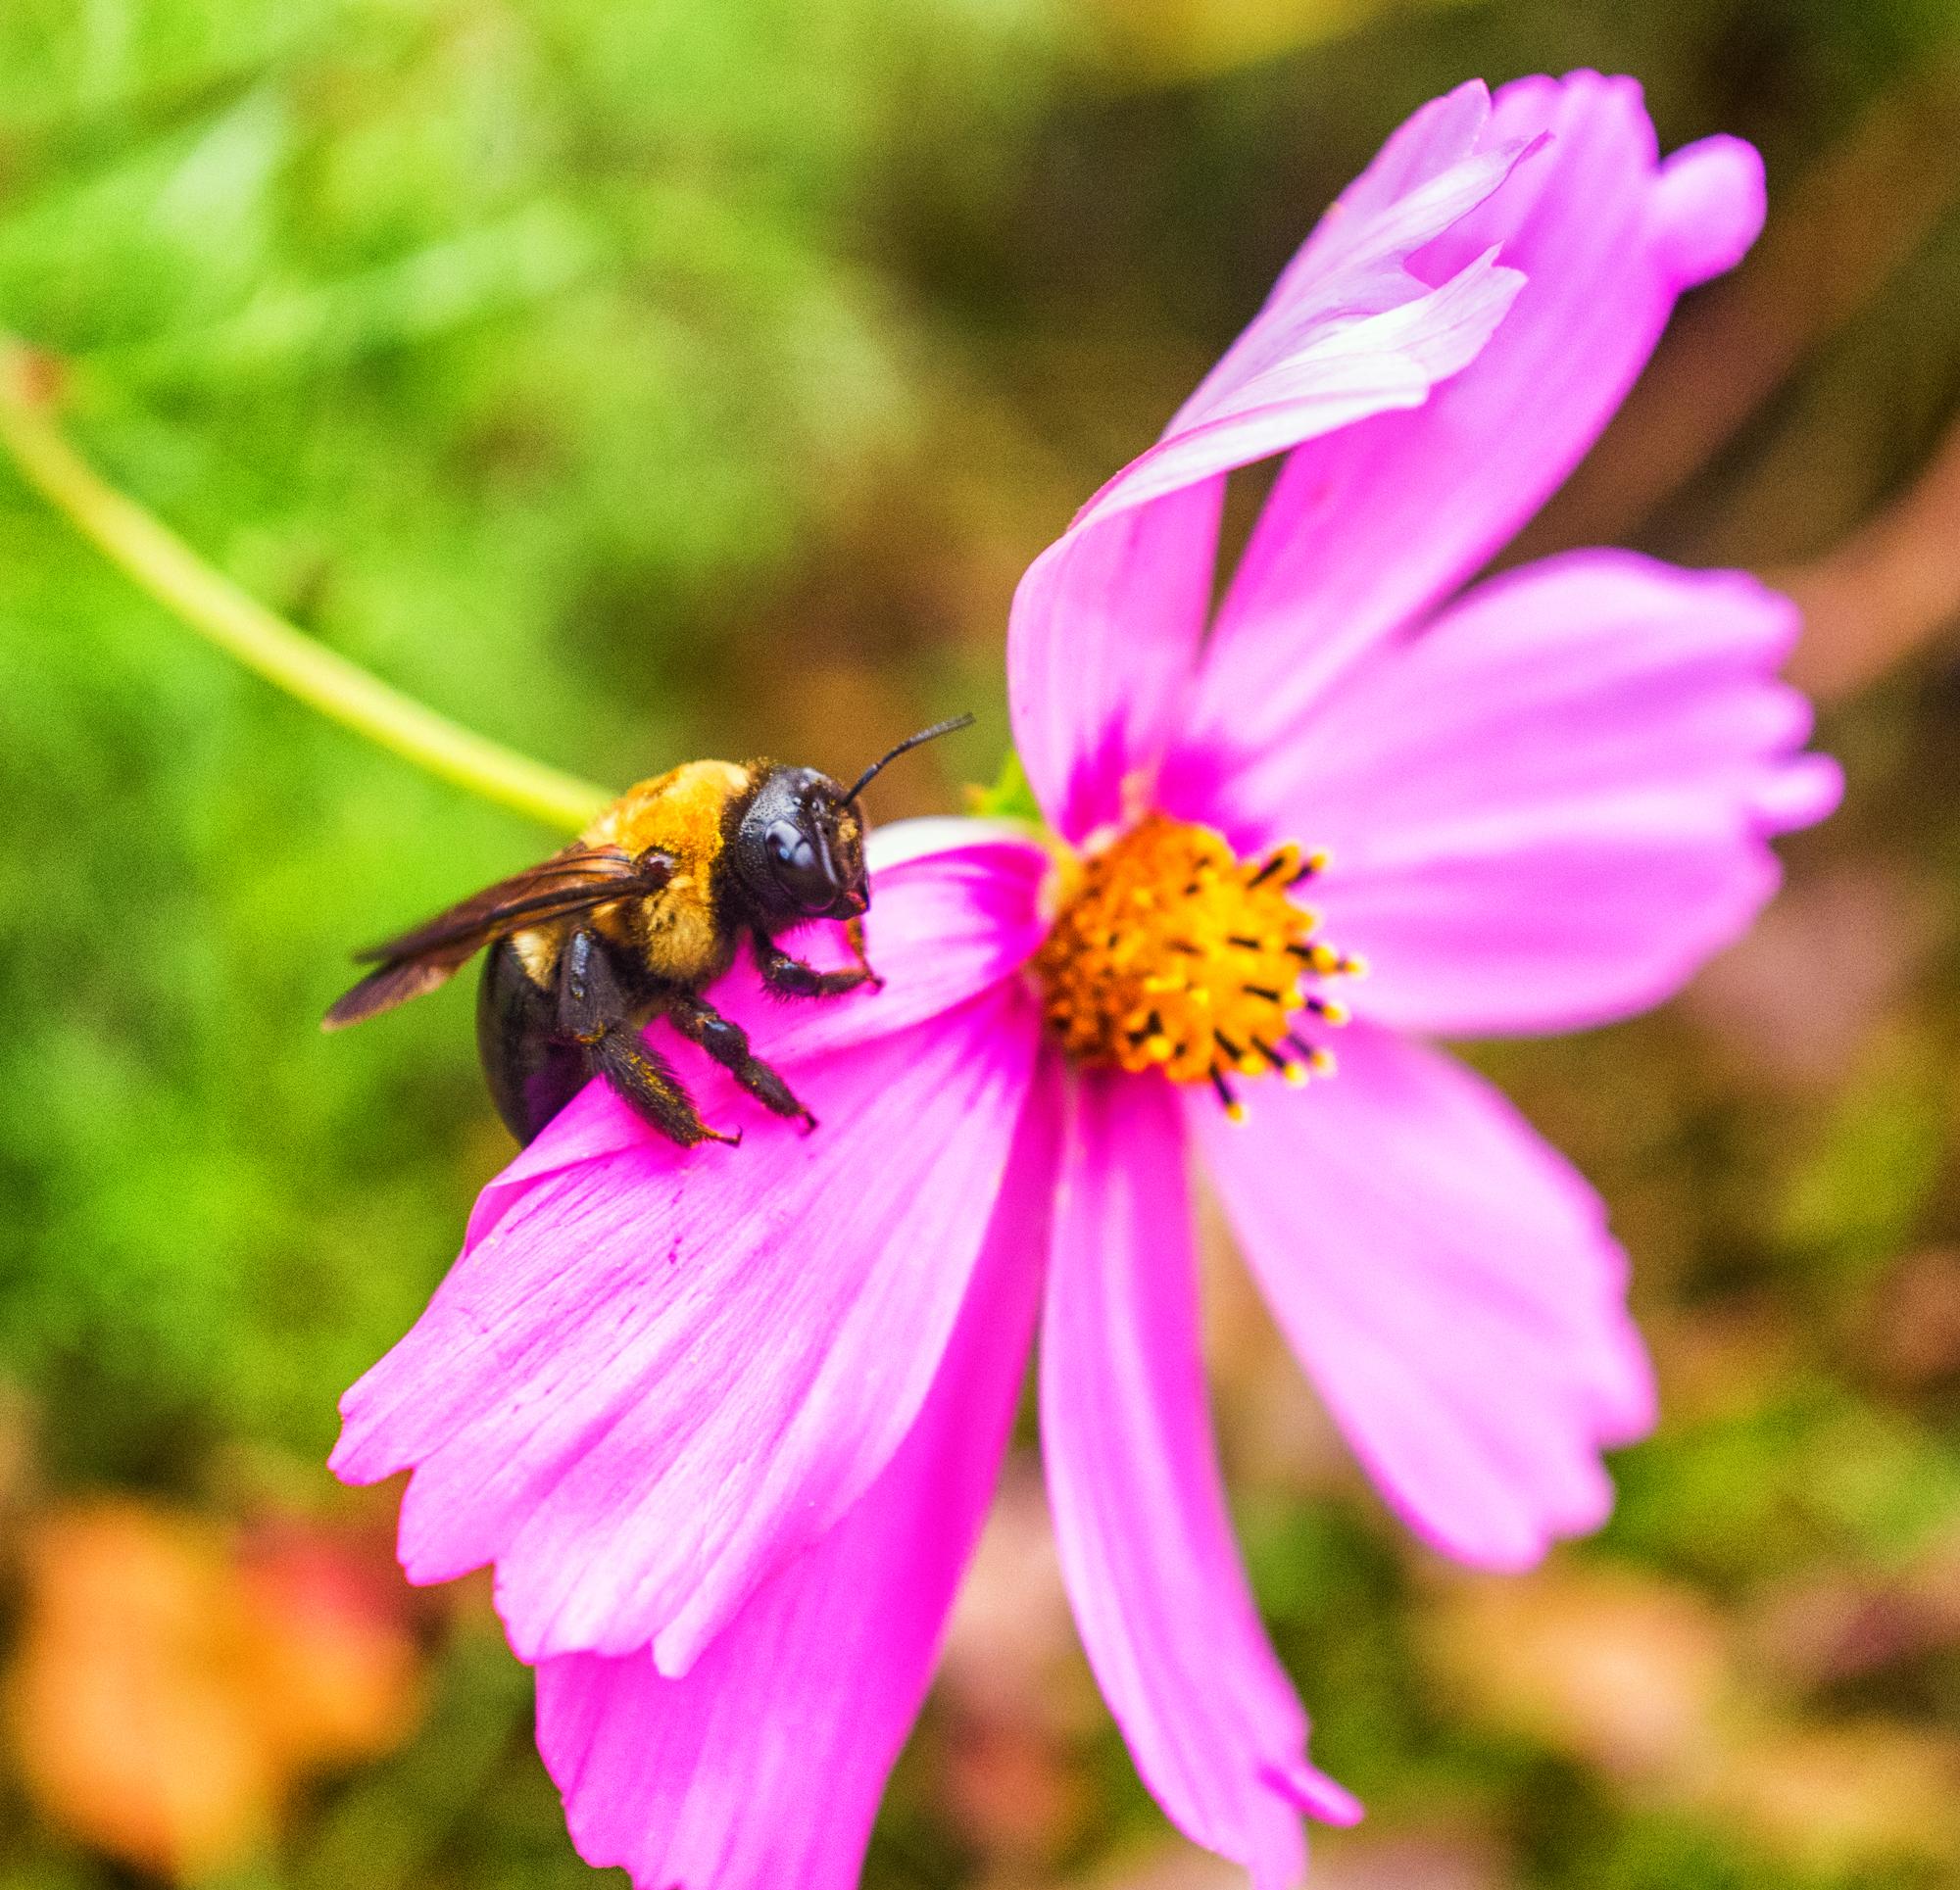 Bumble Bee - Fuji X100, 23mm, f/4.0, ISO 1600, 1/80sec